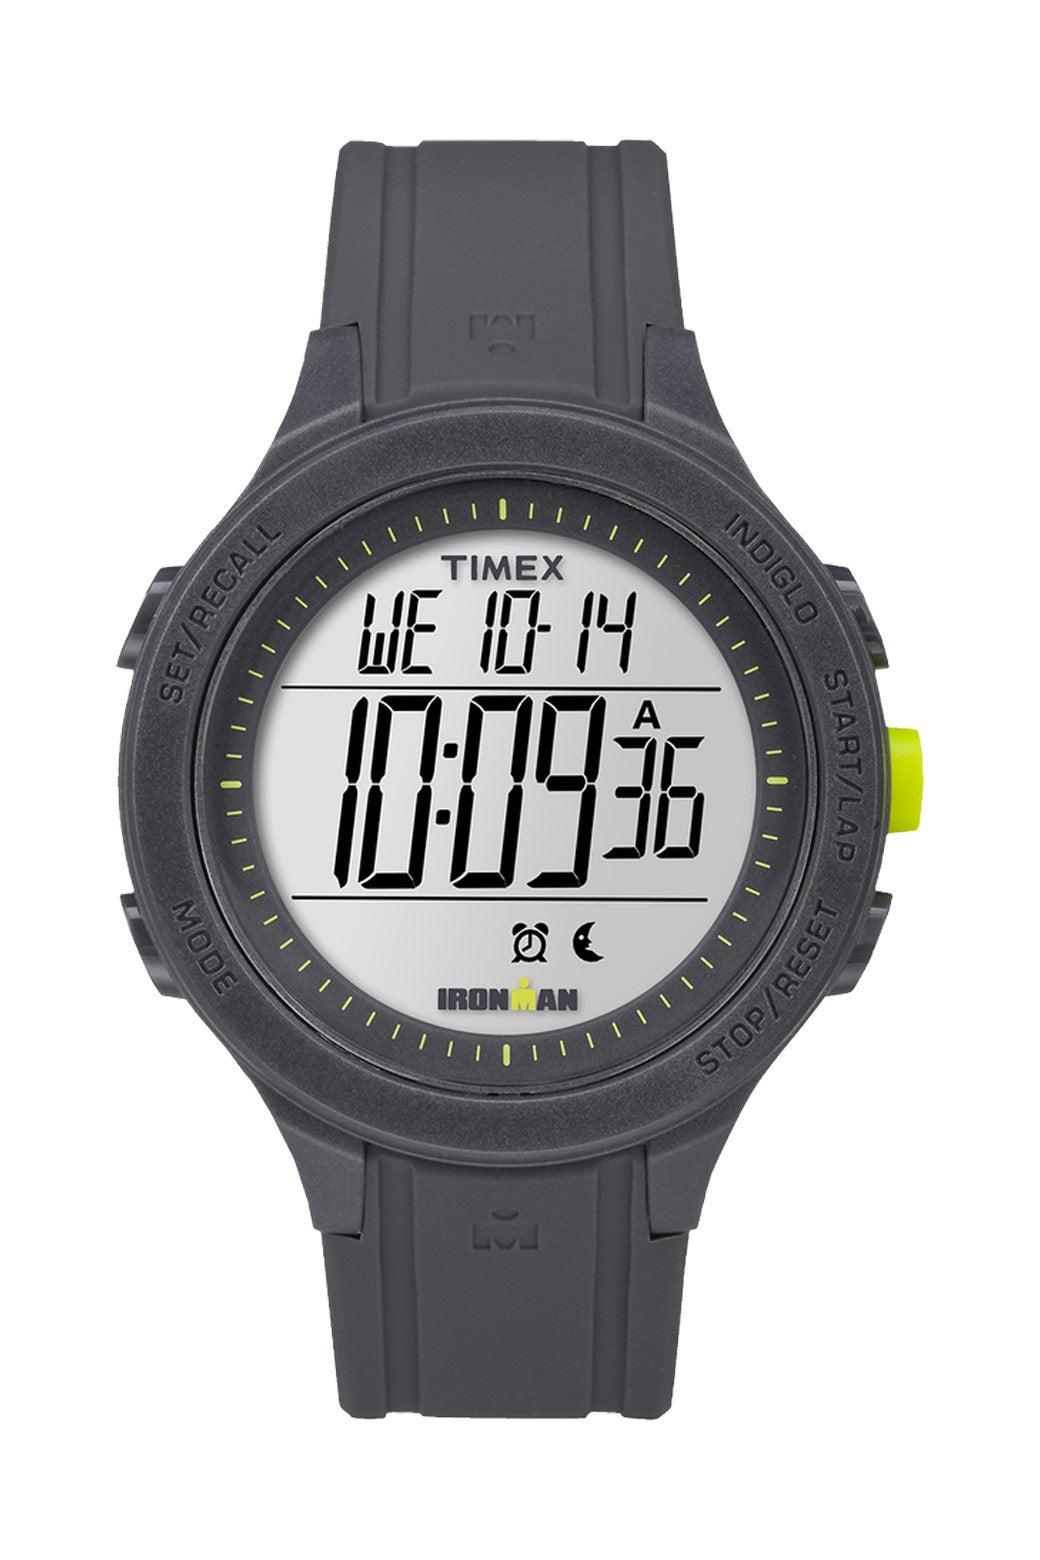 A Timex.